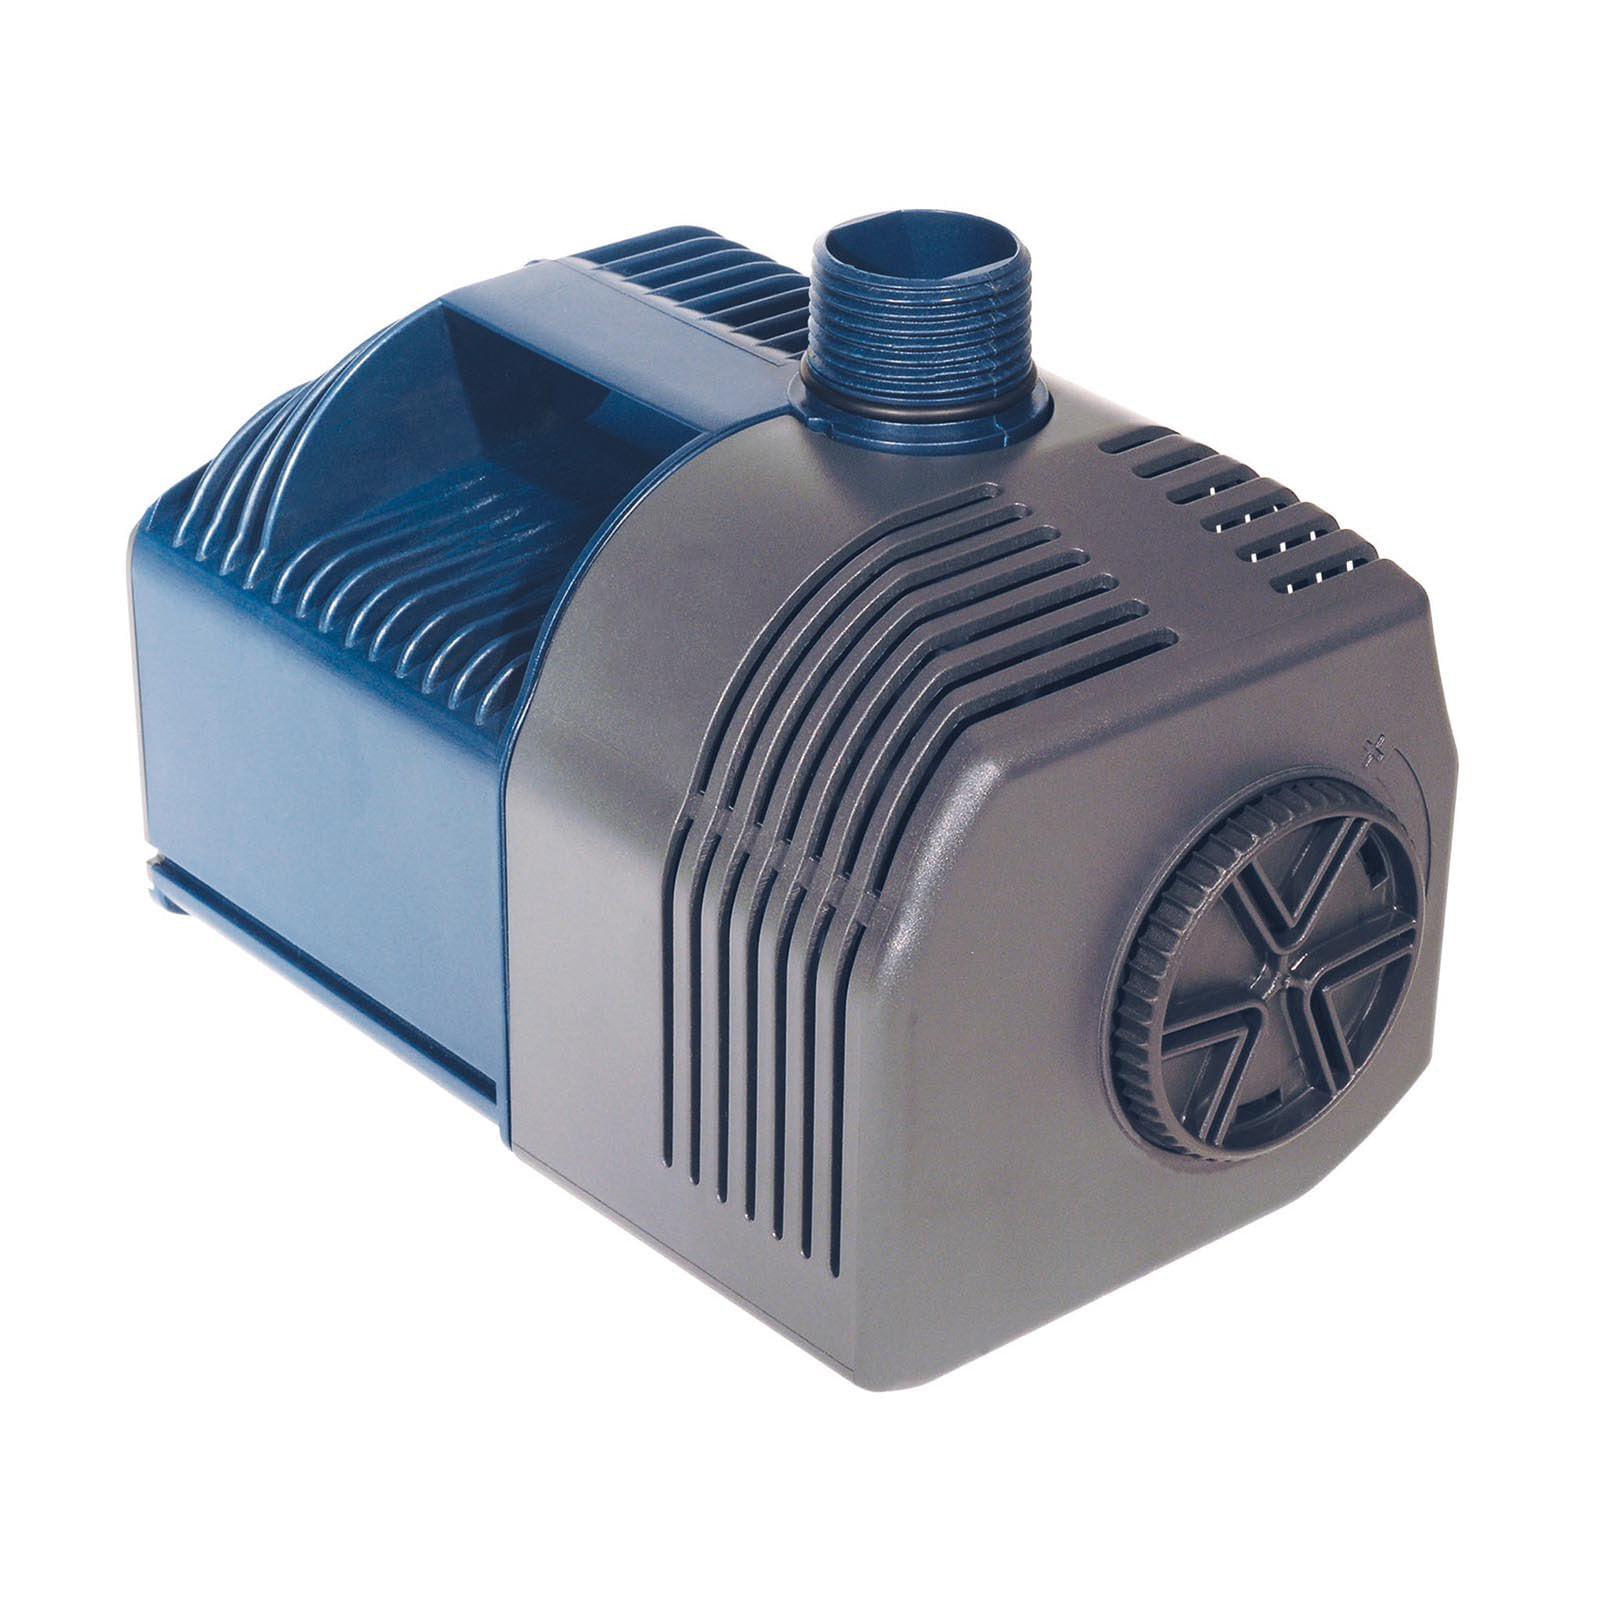 Lifegard Aquatics Quiet One 6000 Fountain Pump